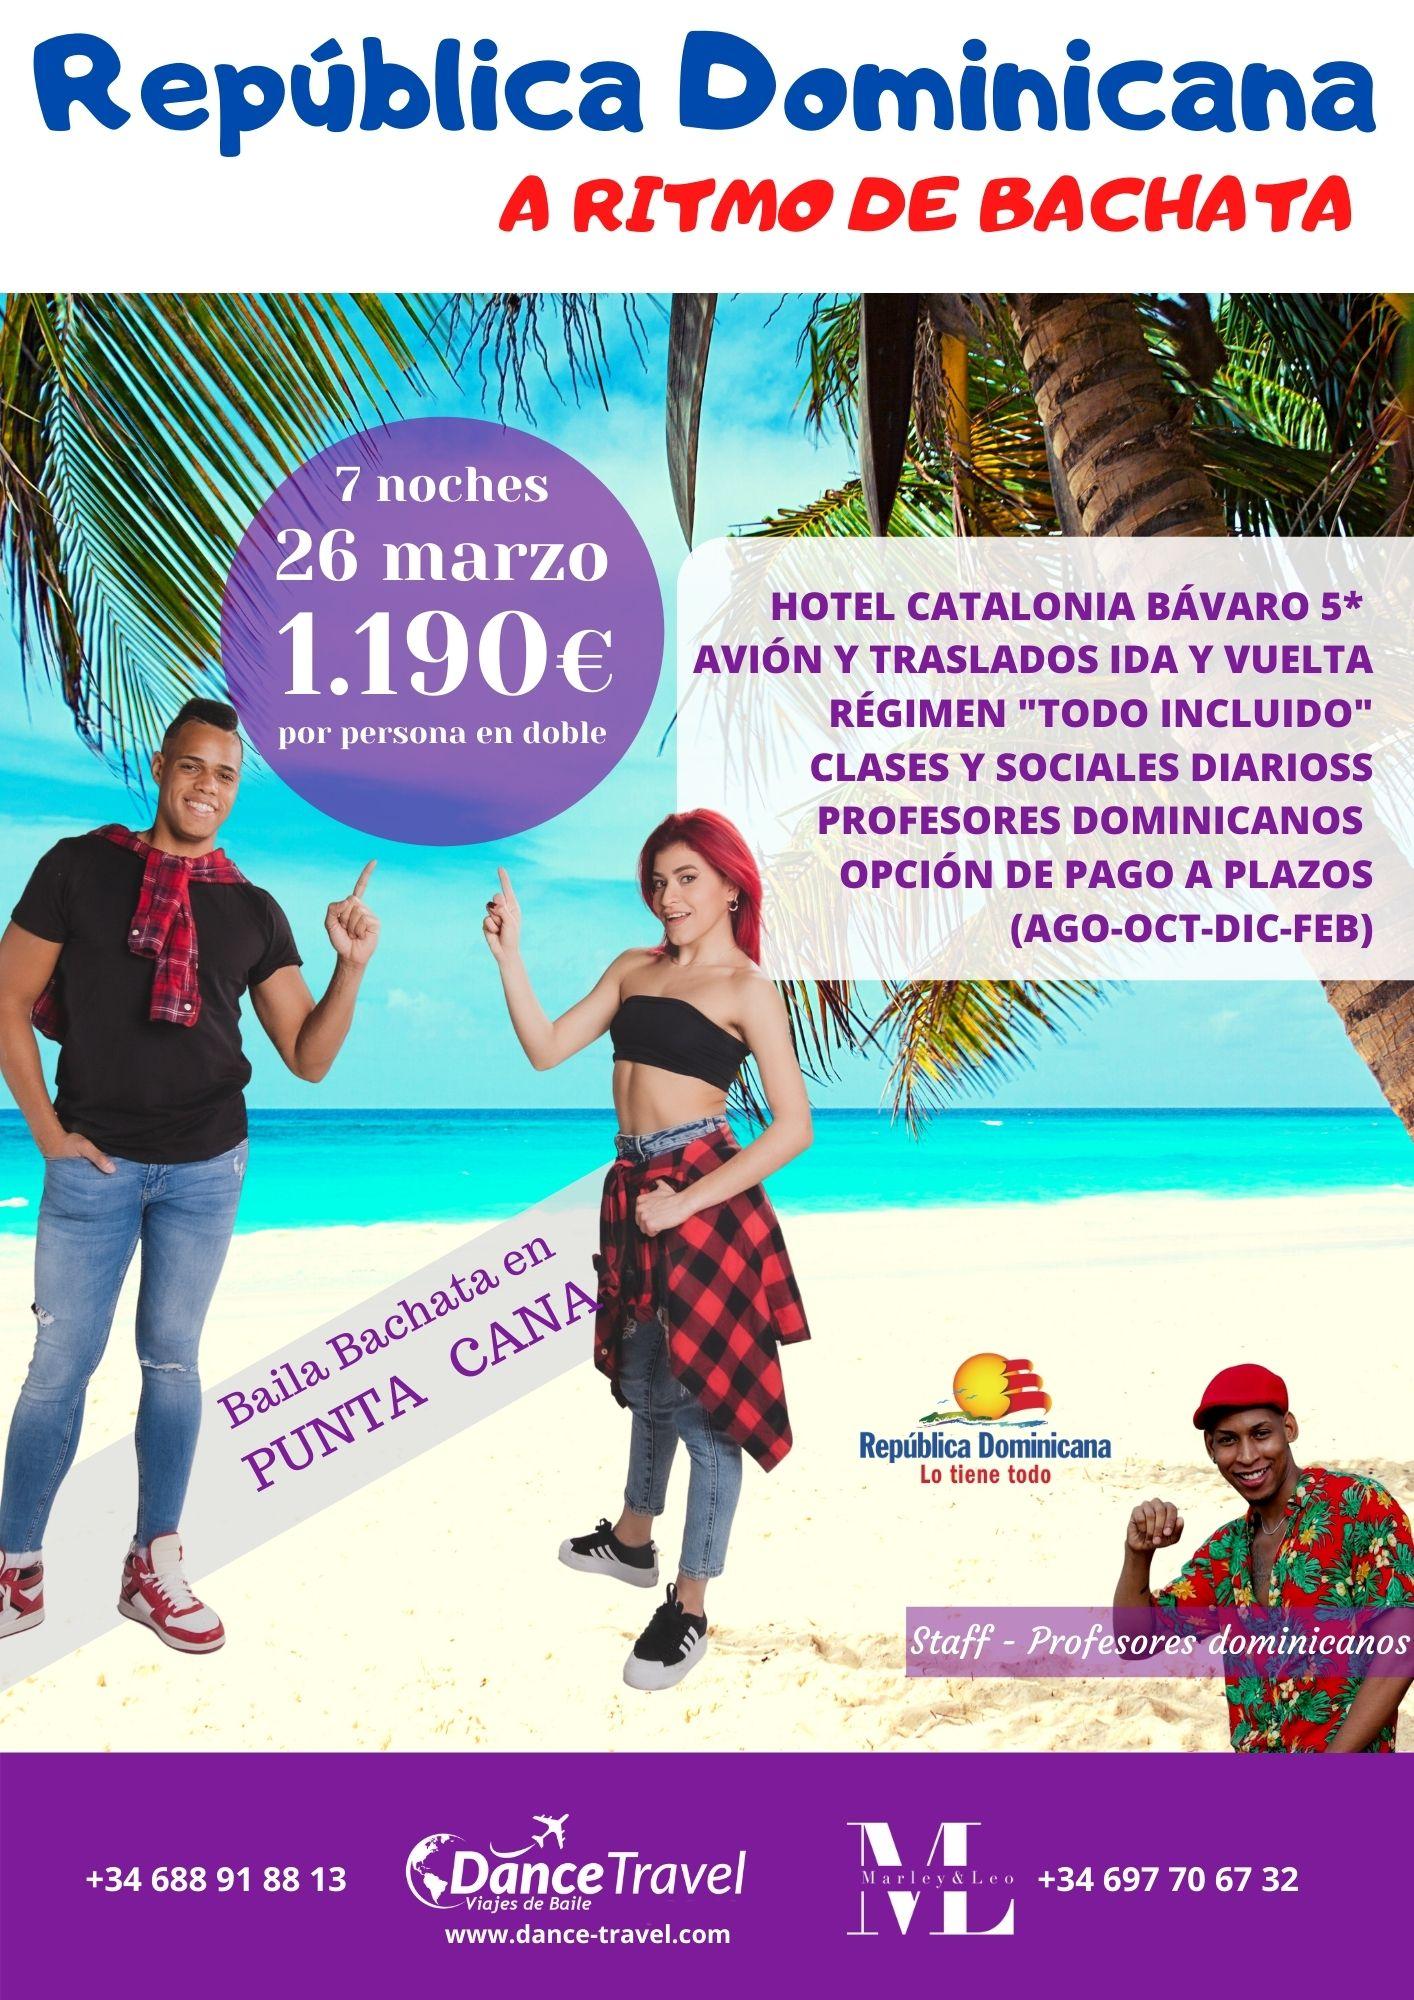 Punta Cana a Ritmo de Bachata Marzo 2022 M&L